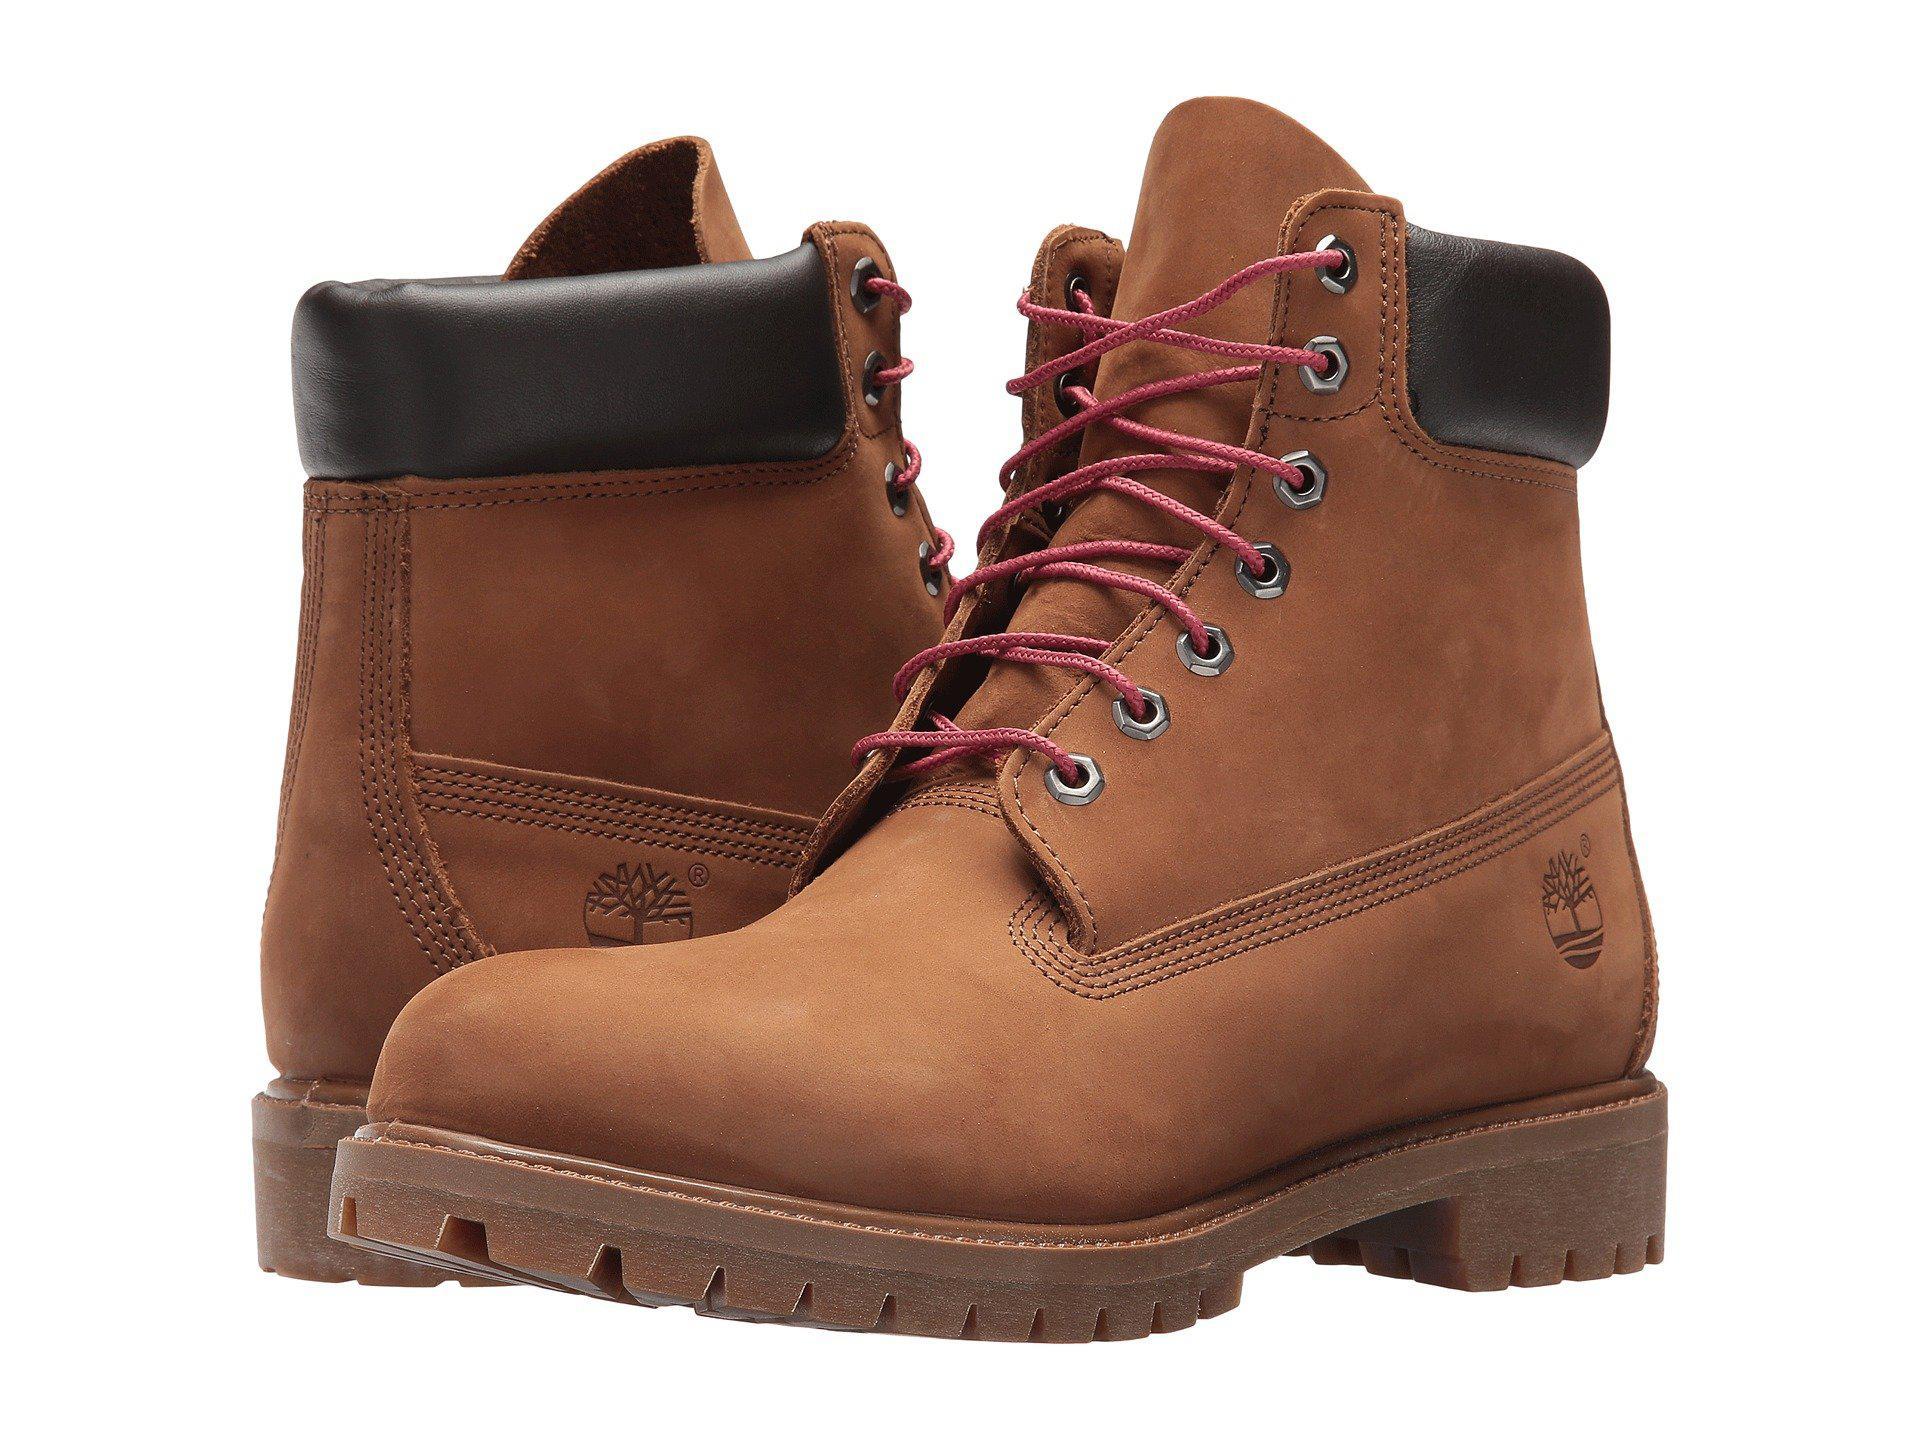 44b0acae4a2 Lyst - Timberland 6 Premium Boot (tundra Waterbuck) Men s Boots in ...